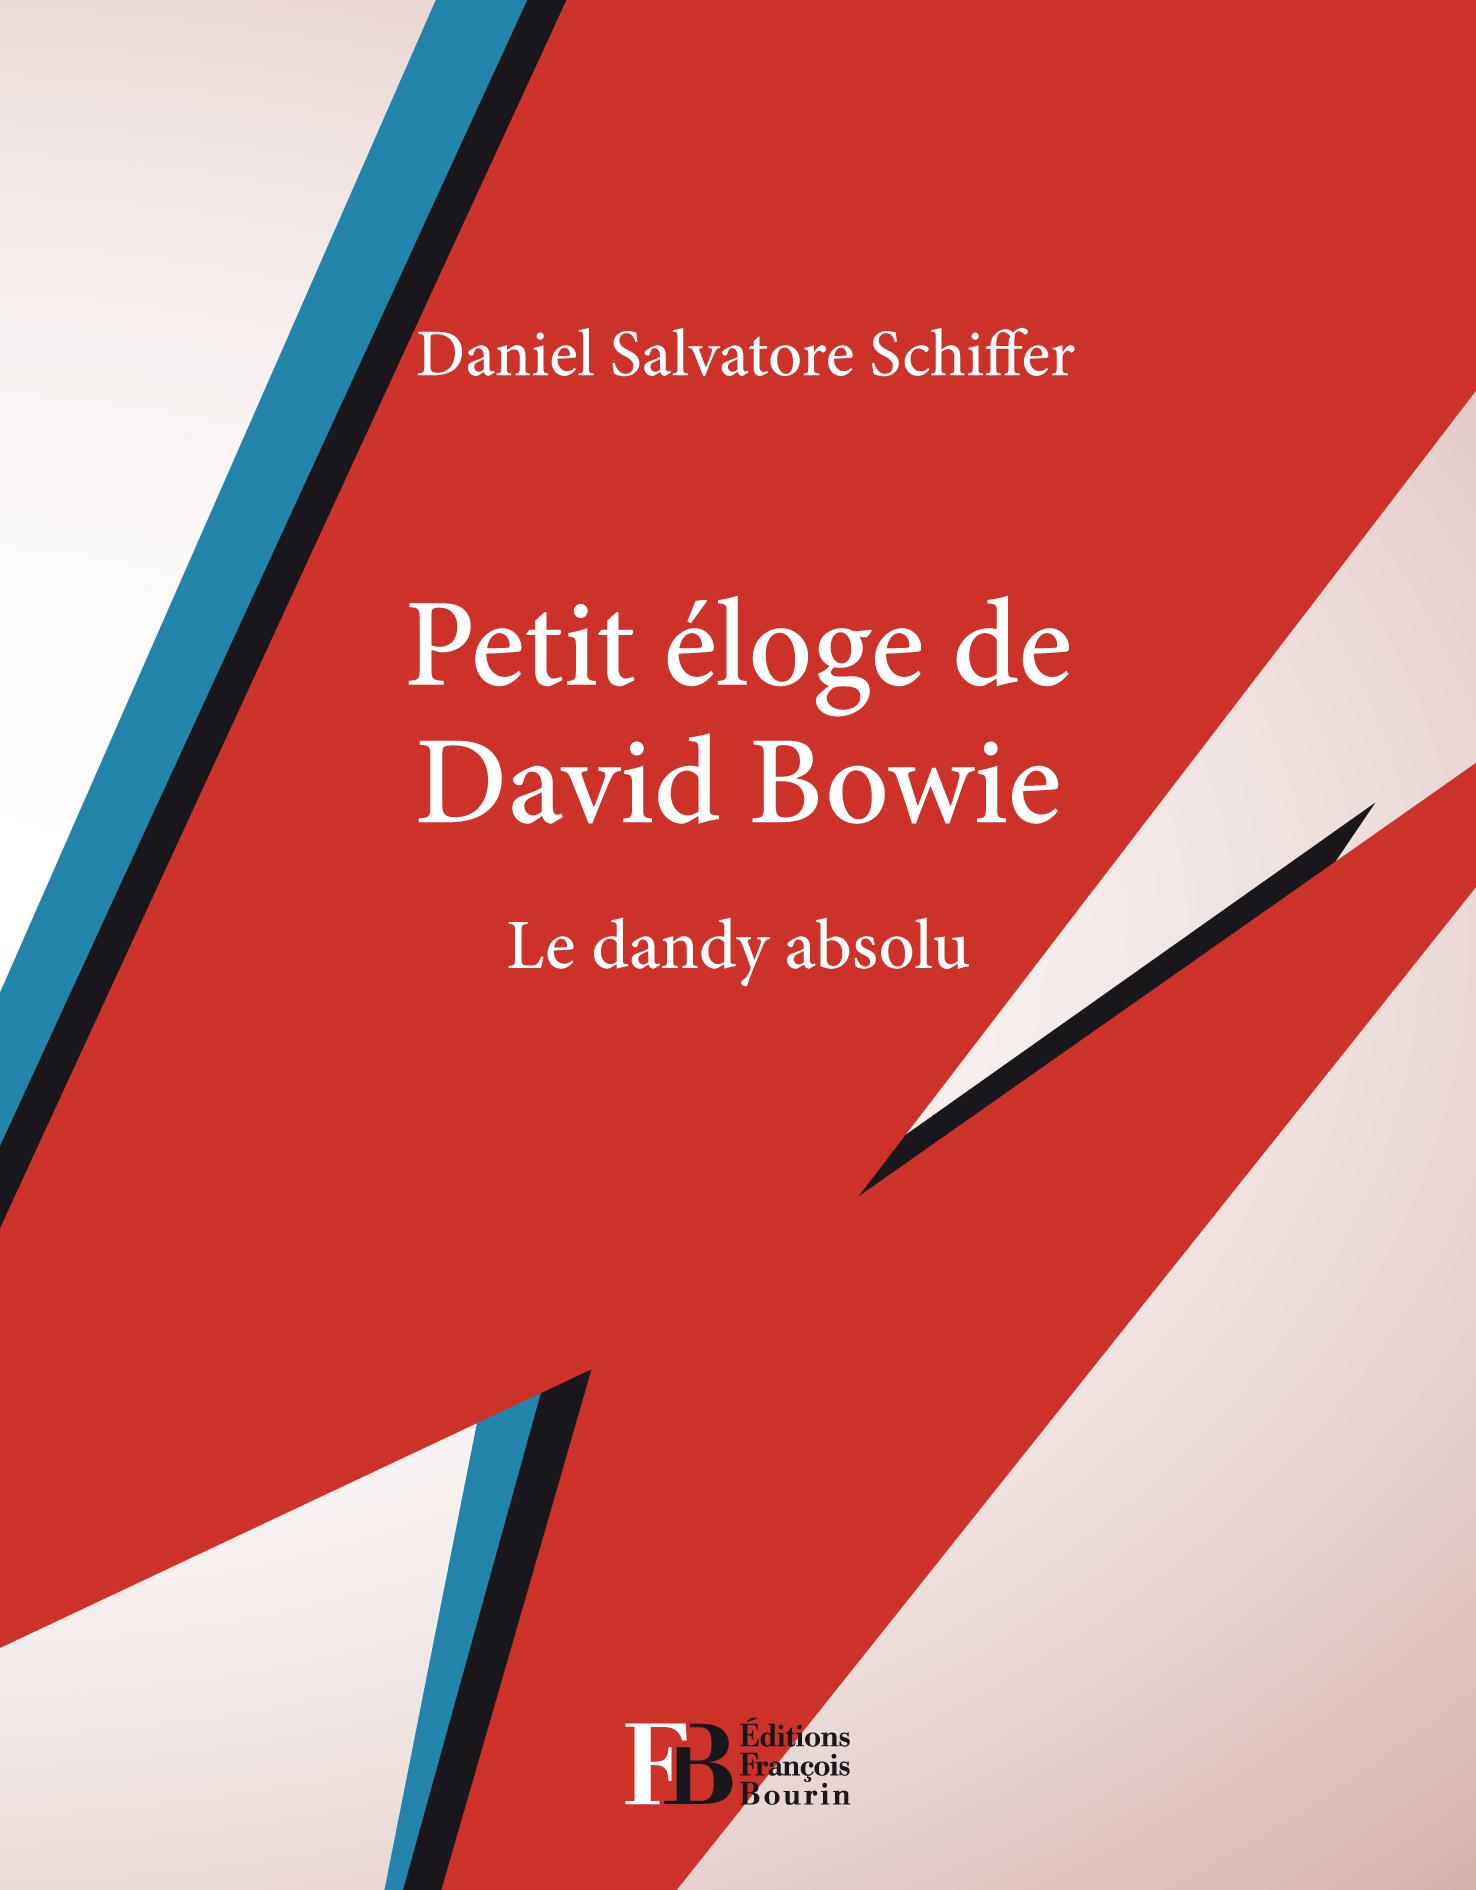 Petit ?loge de David Bowie, Le dandy absolu